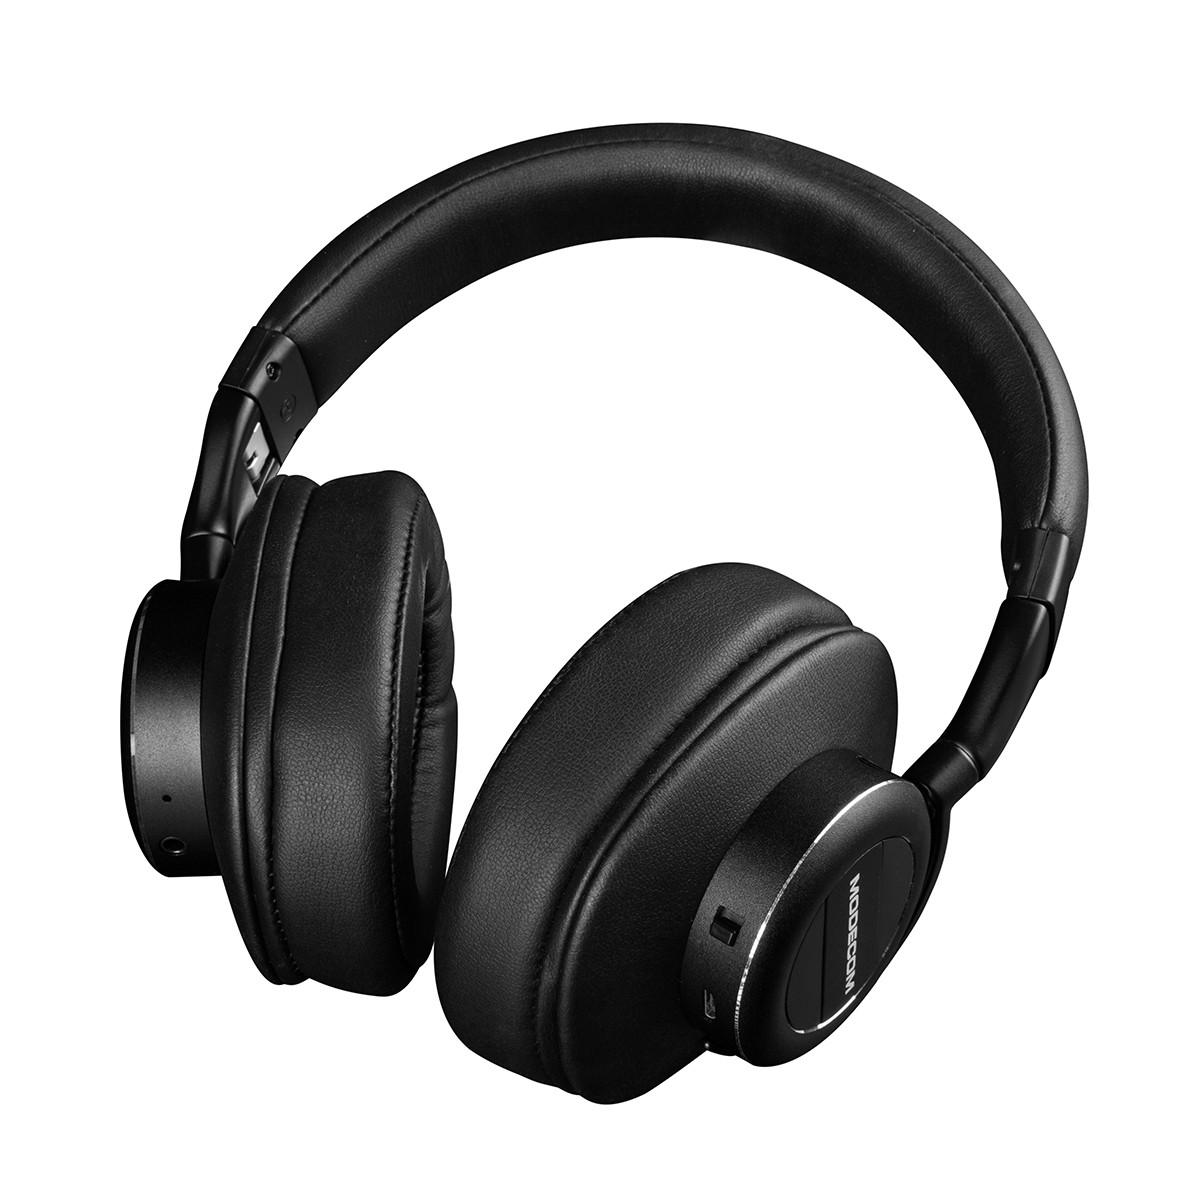 Modecom S-MC-1001HF hoofdtelefoon/headset Hoofdtelefoons Hoofdband 3,5mm-connector Bluetooth Zwart